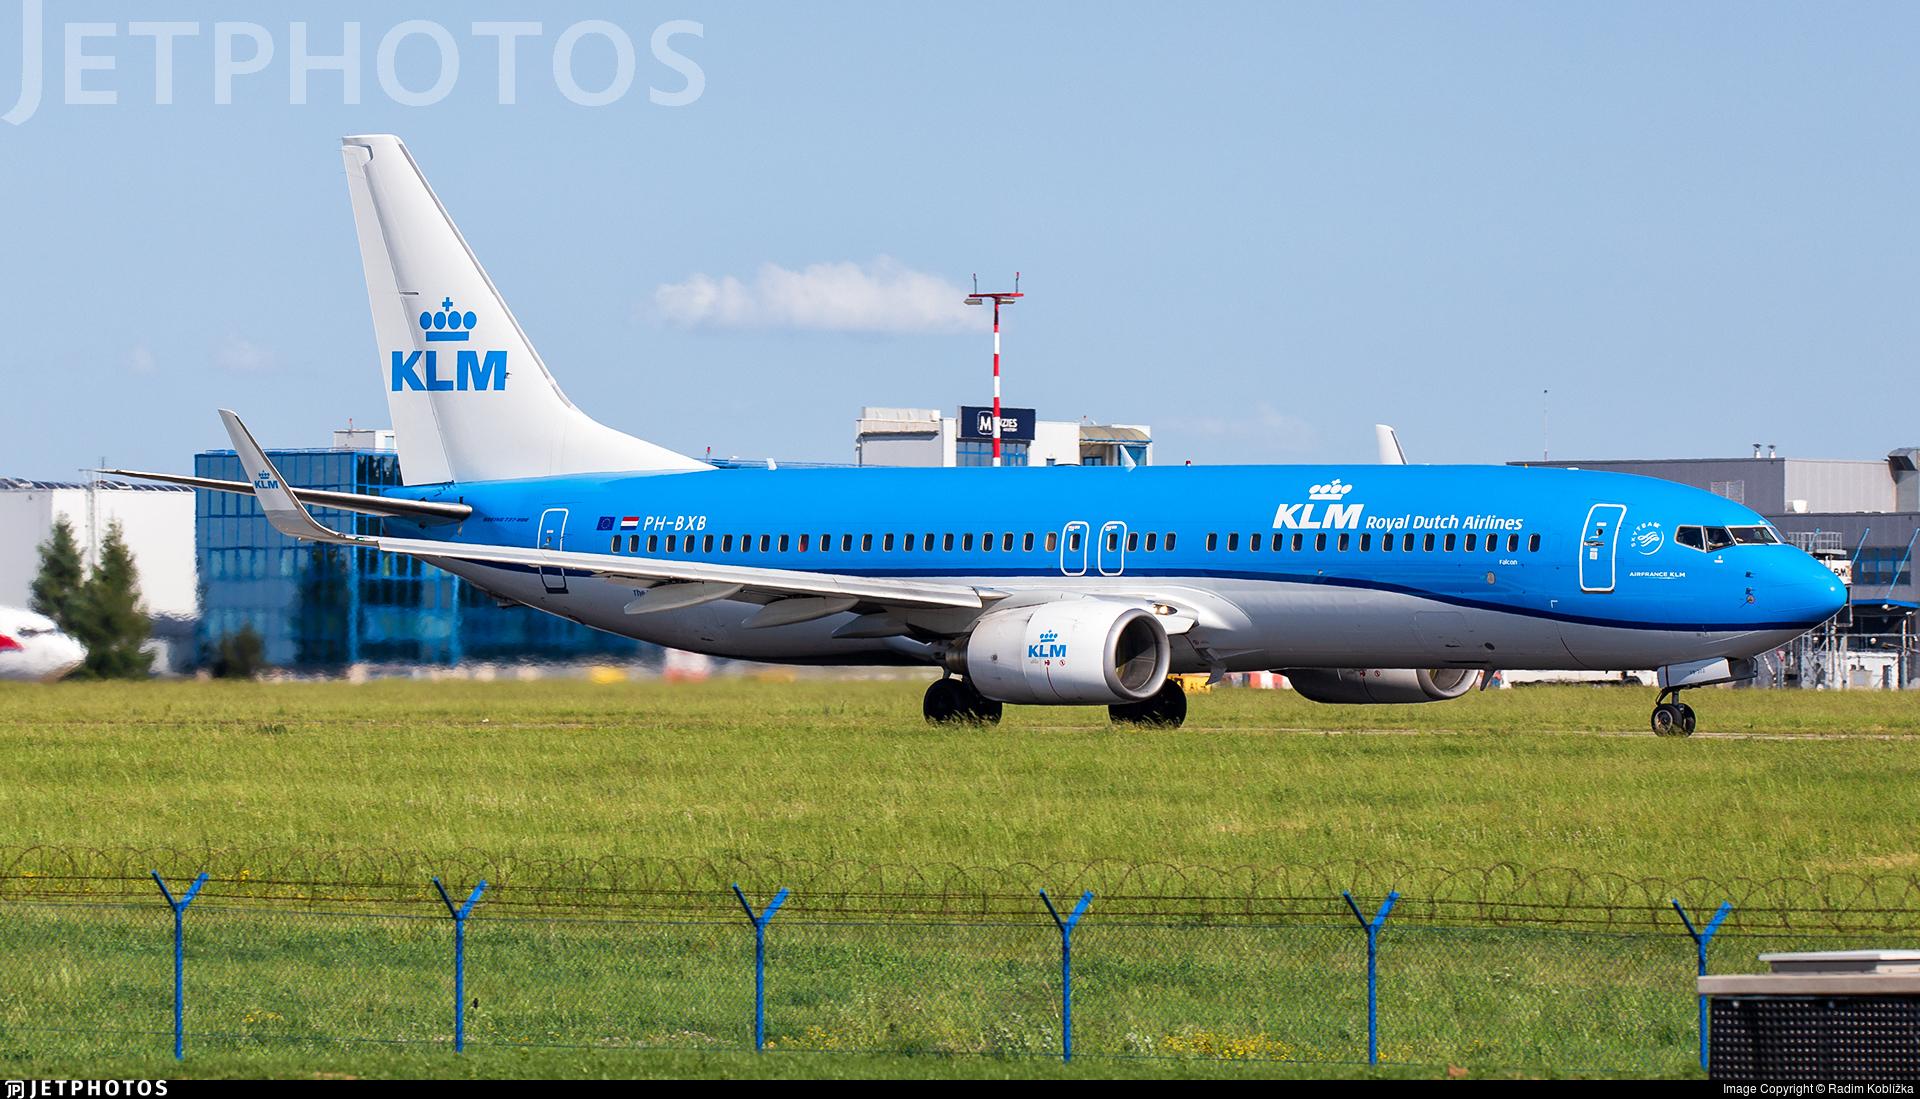 PH-BXB - Boeing 737-8K2 - KLM Royal Dutch Airlines